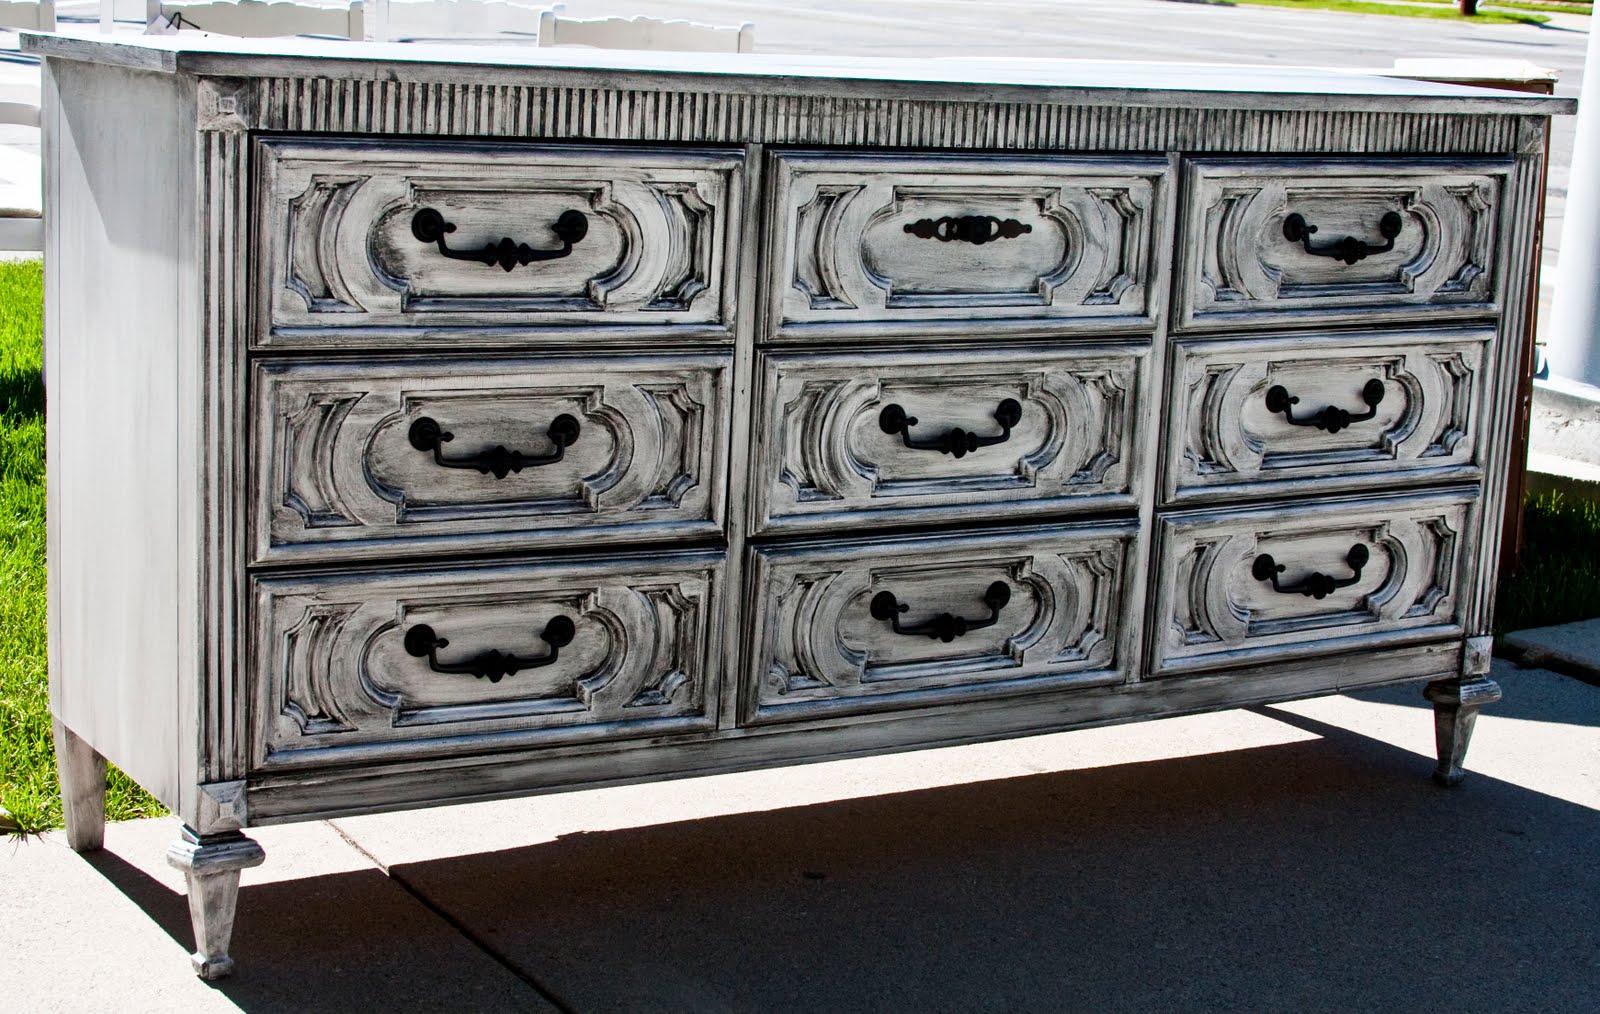 modernly shabby chic furniture 9 drawer white and black dresser. Black Bedroom Furniture Sets. Home Design Ideas